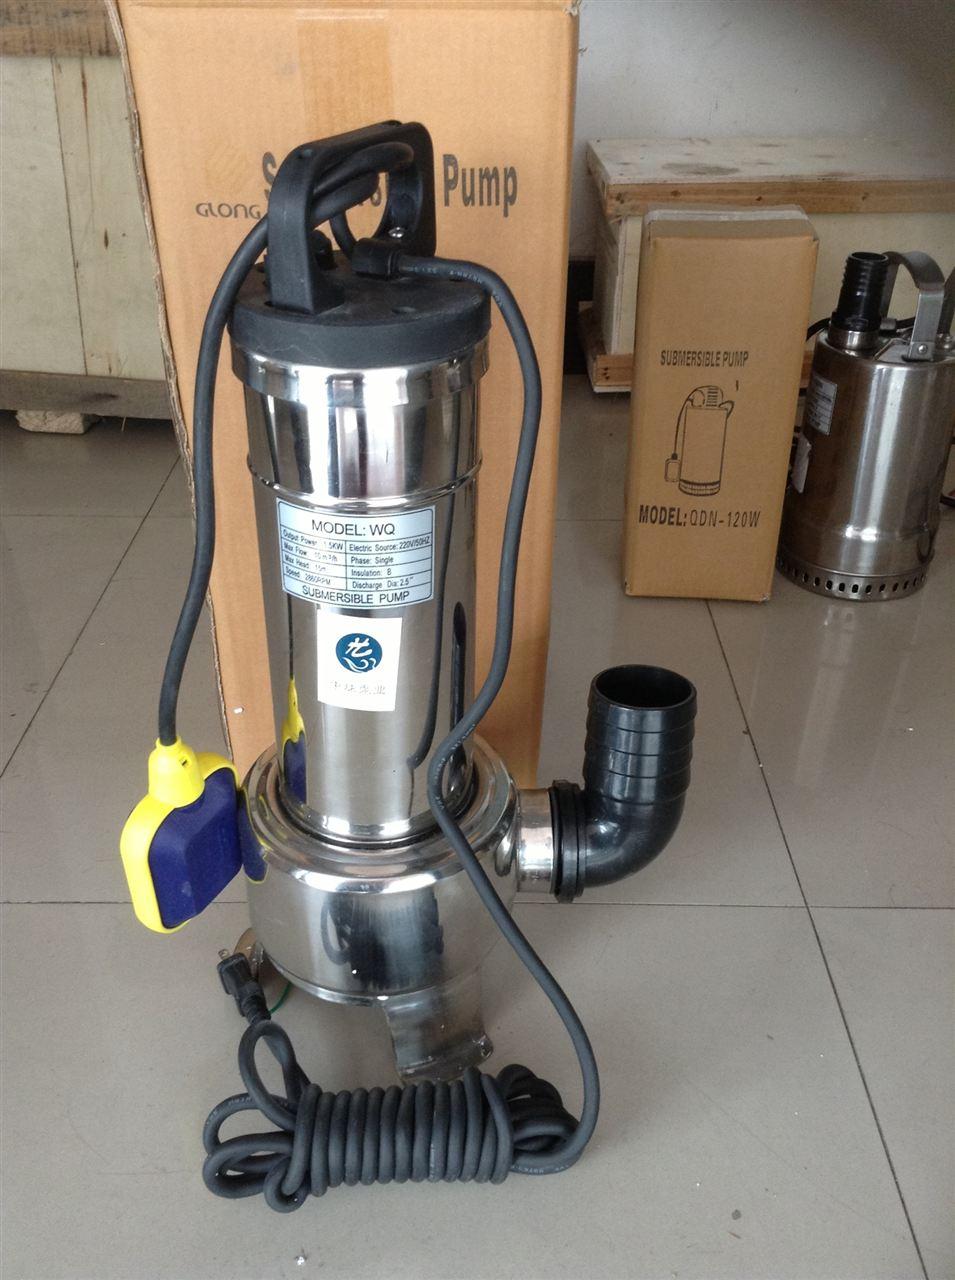 wqd不锈钢单相潜水泵基本说明 wqd不锈钢单相潜水泵电压220v ,小型手